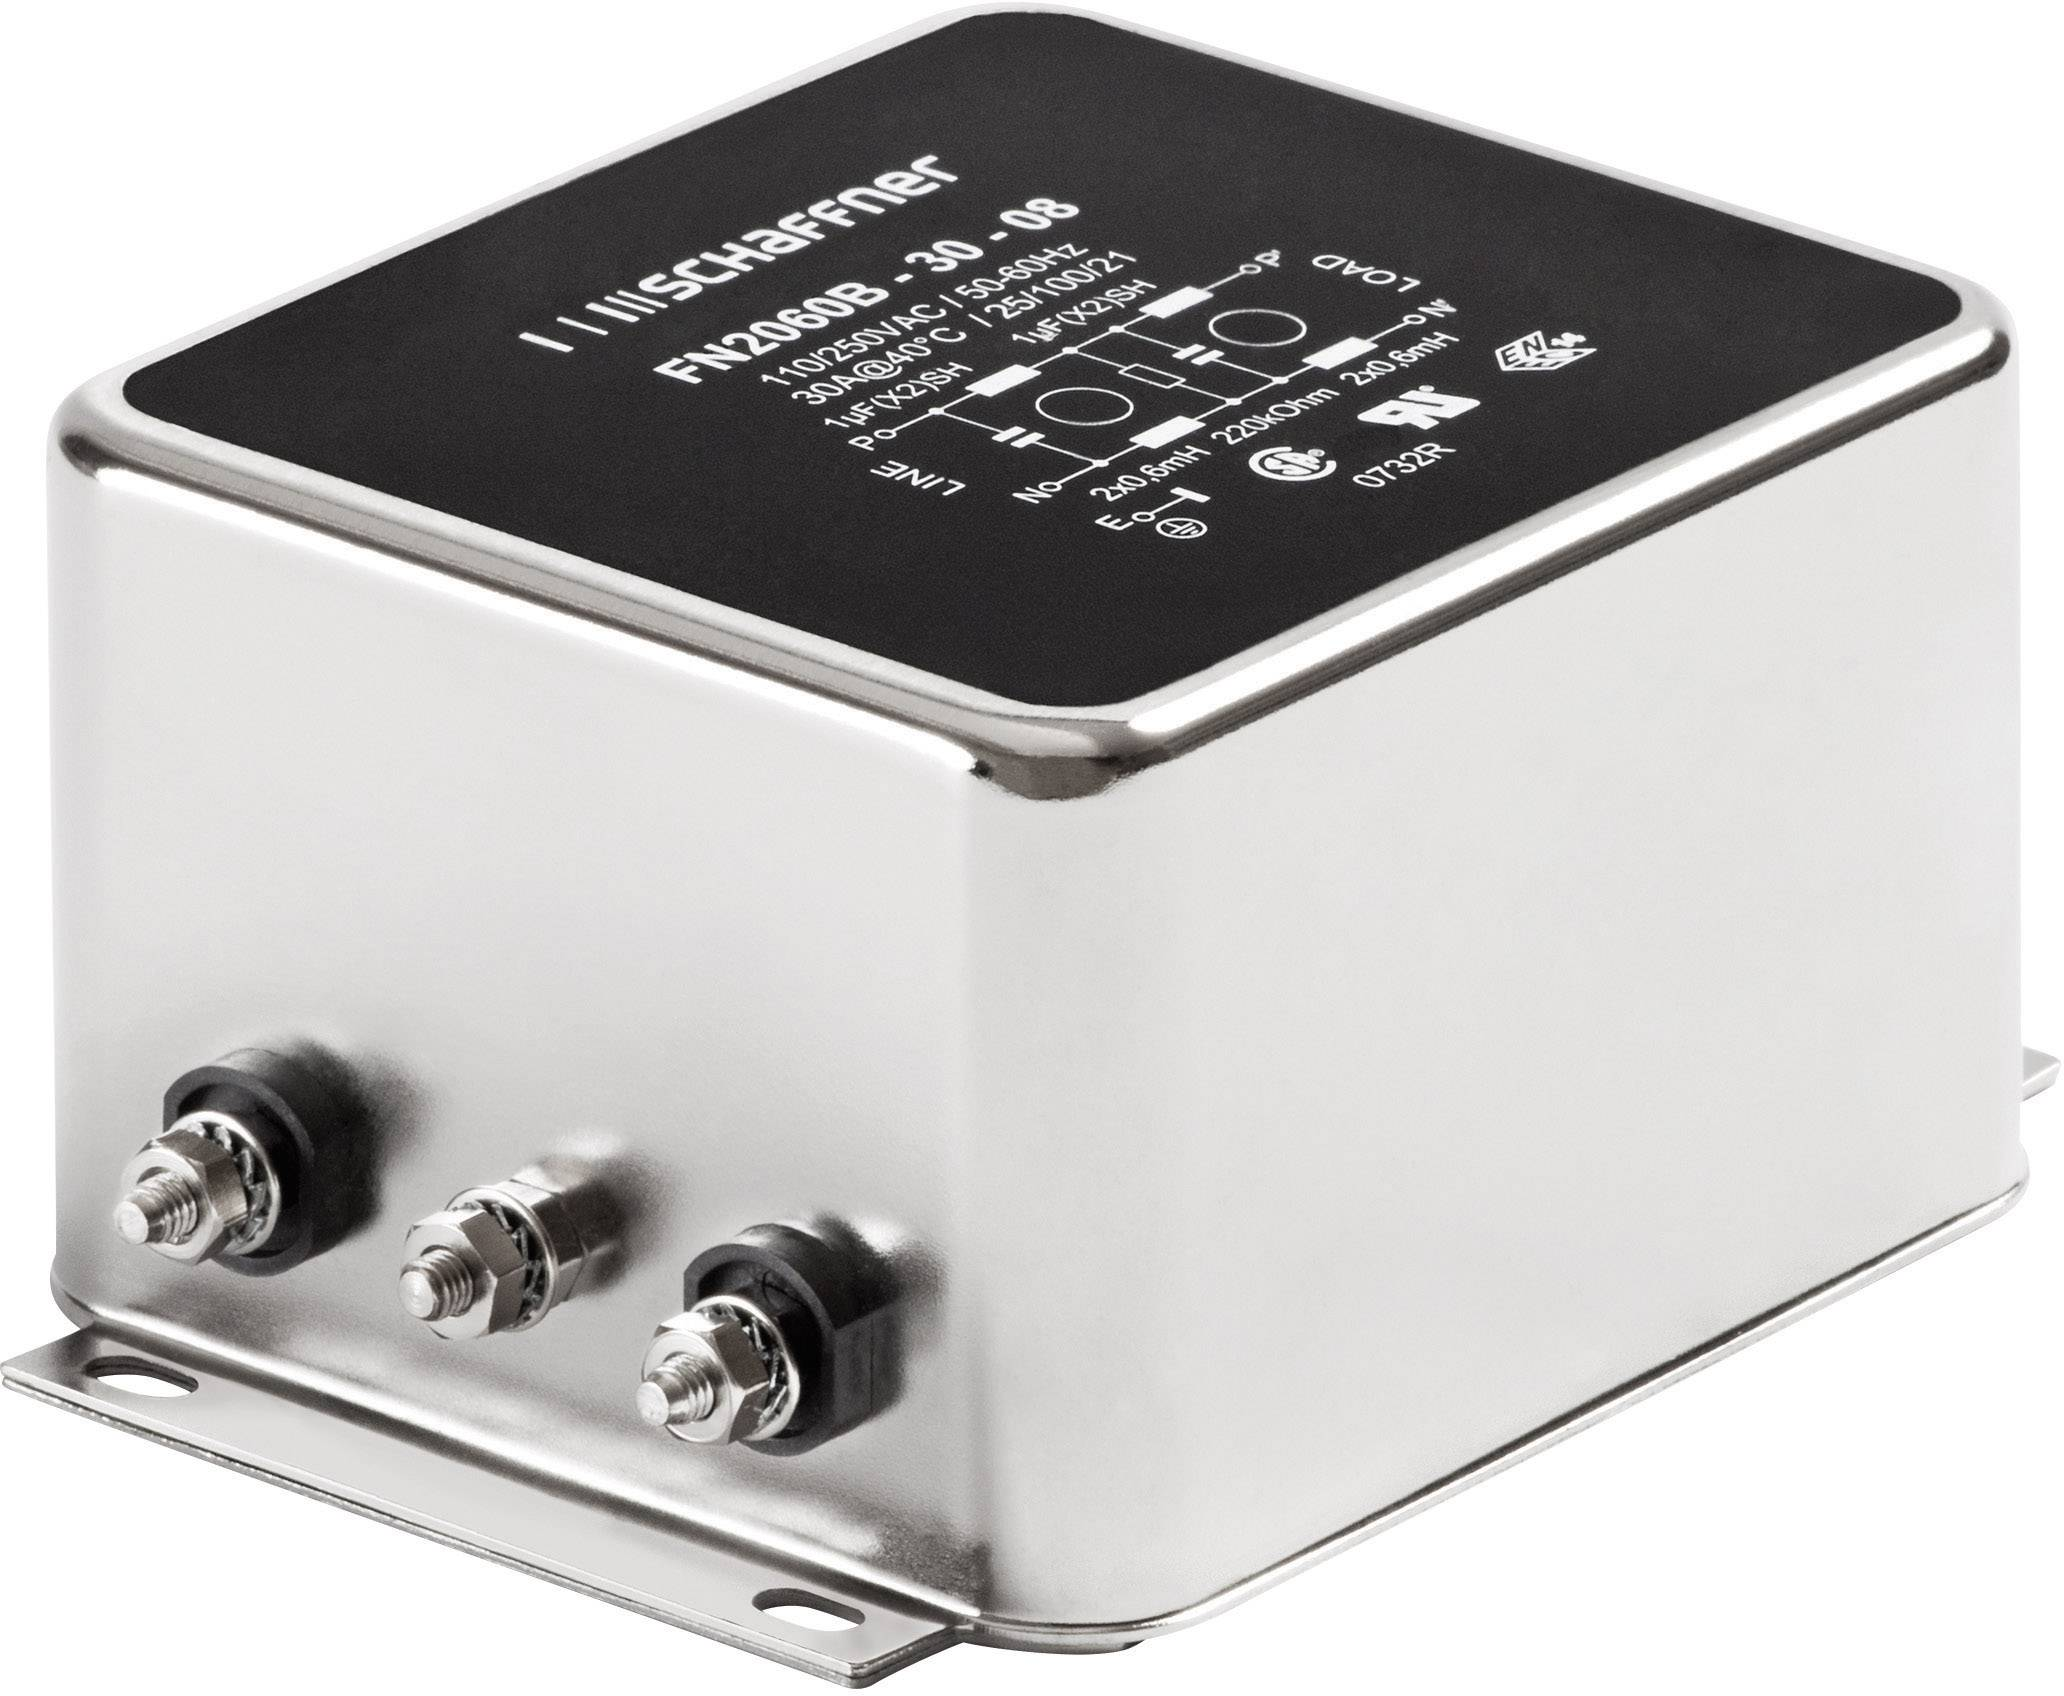 Síťový filtr Schaffner, FN 2060-6-06, 0,97 mH, 250 V/AC, 6 A